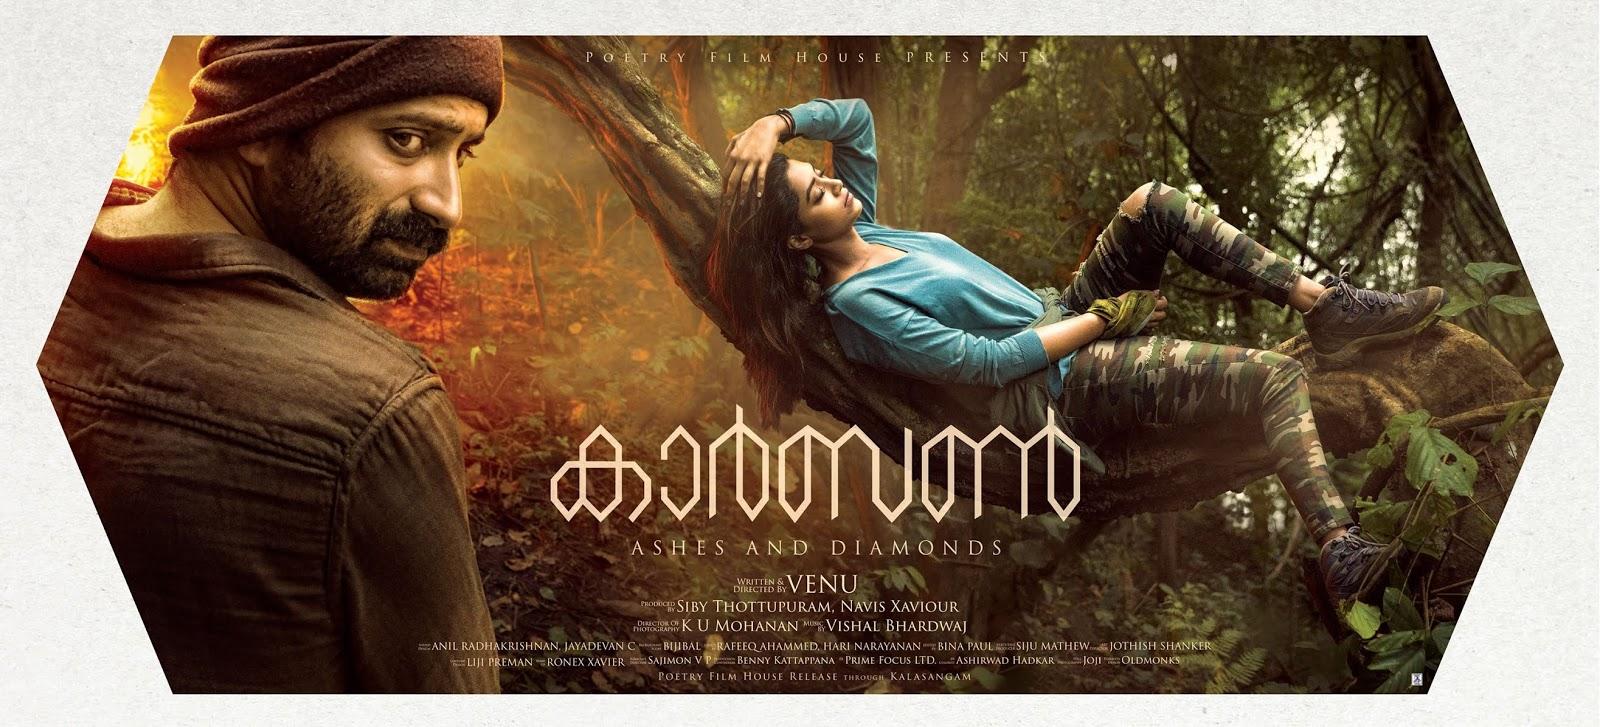 carbon malayalam movie torrent download torrent